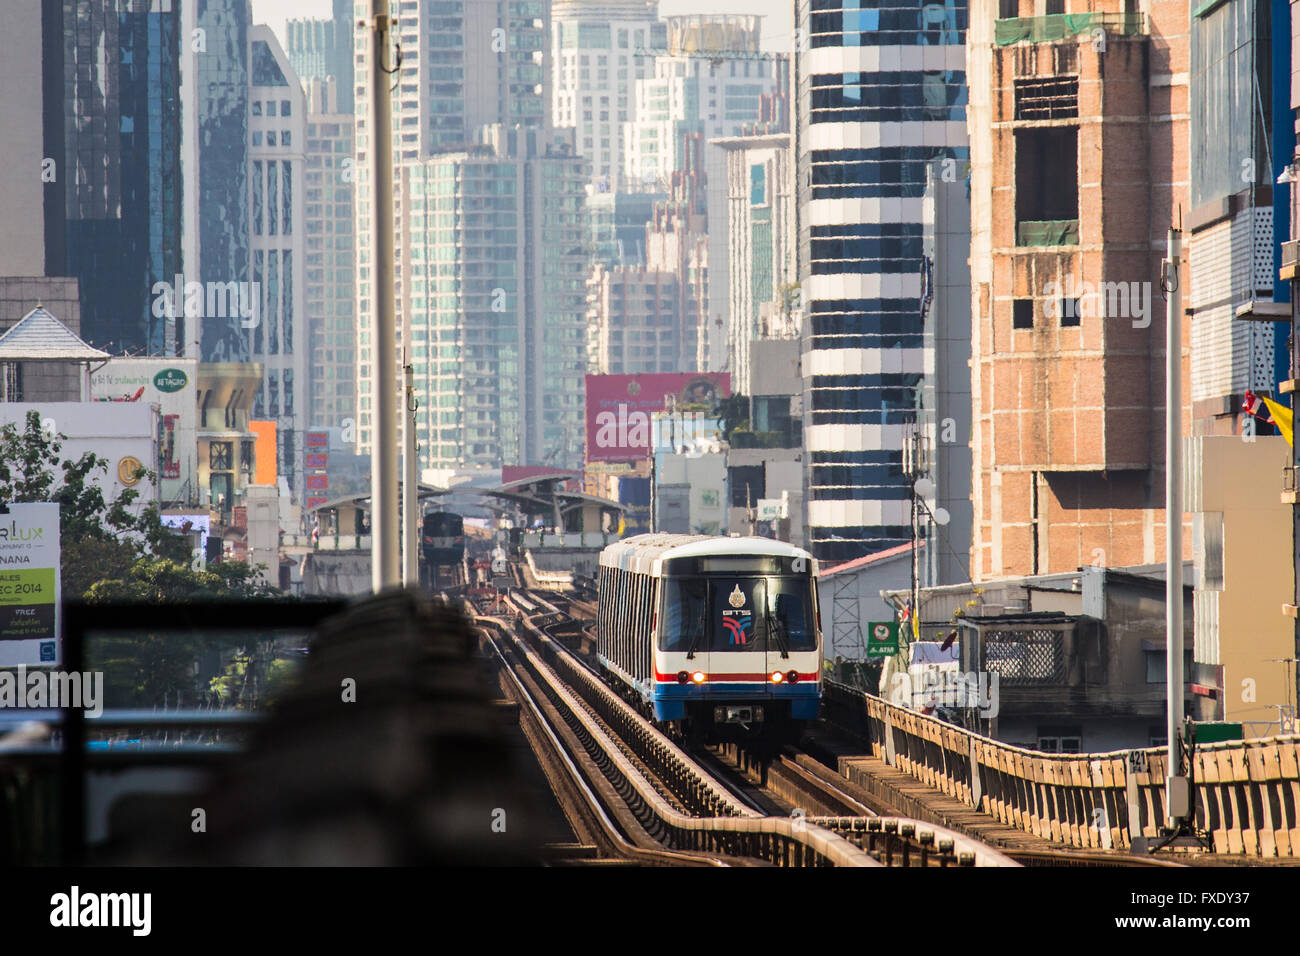 BTS Skytrain in Bangkok, Thailand Stock Photo